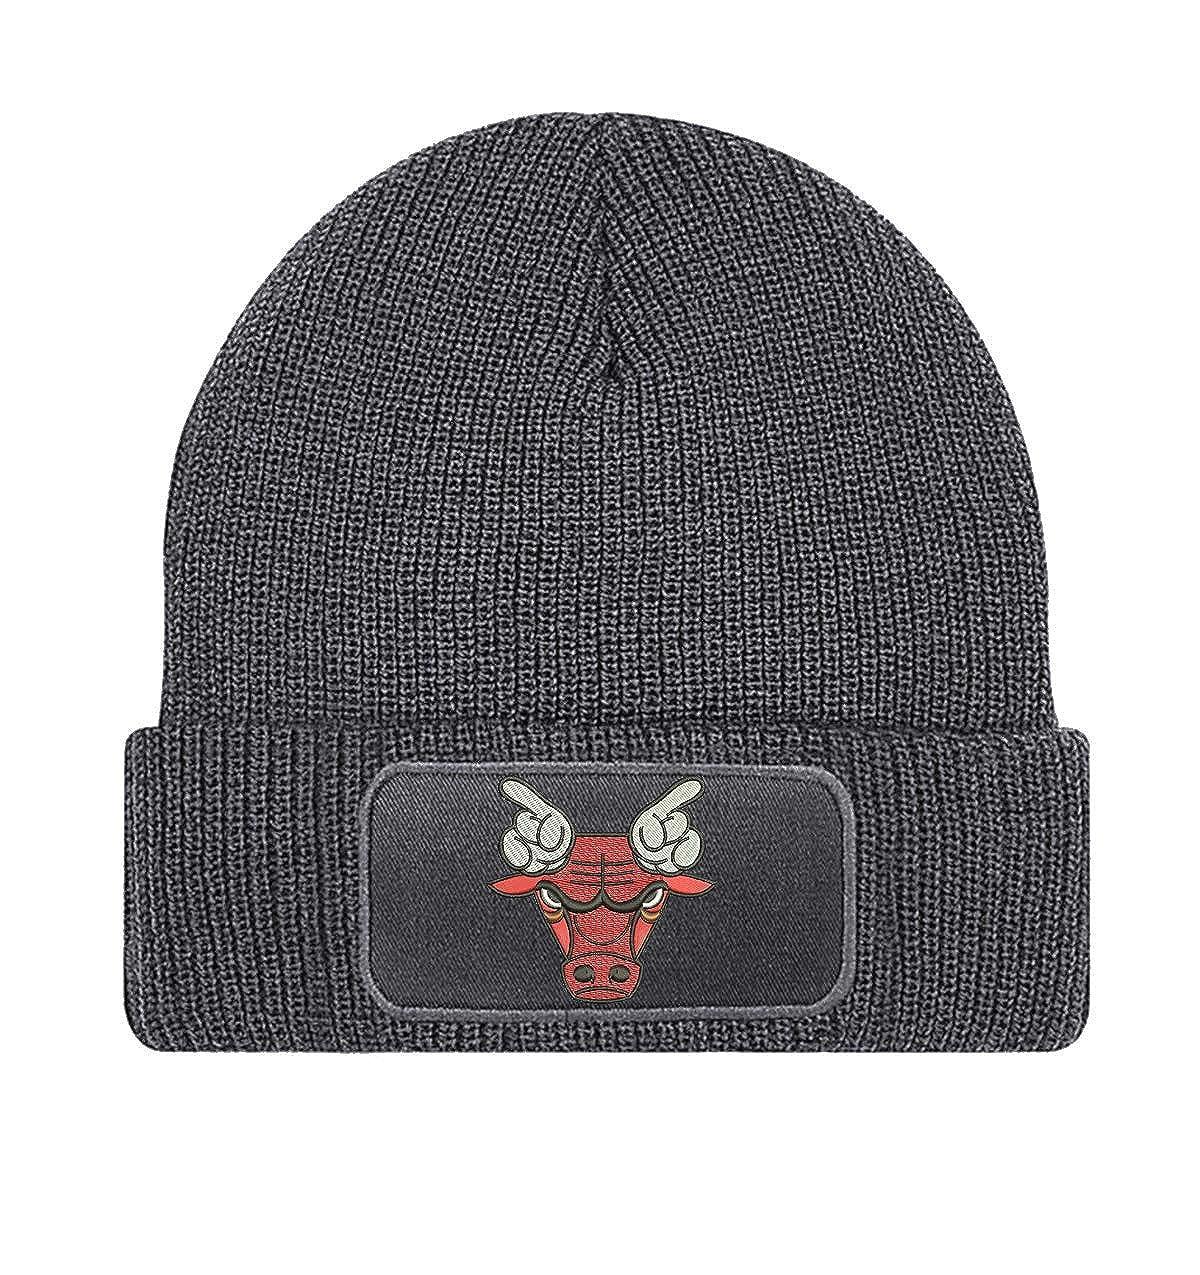 Natshop2000 Chicago Bulls STICK091 - Balón de Baloncesto con ...